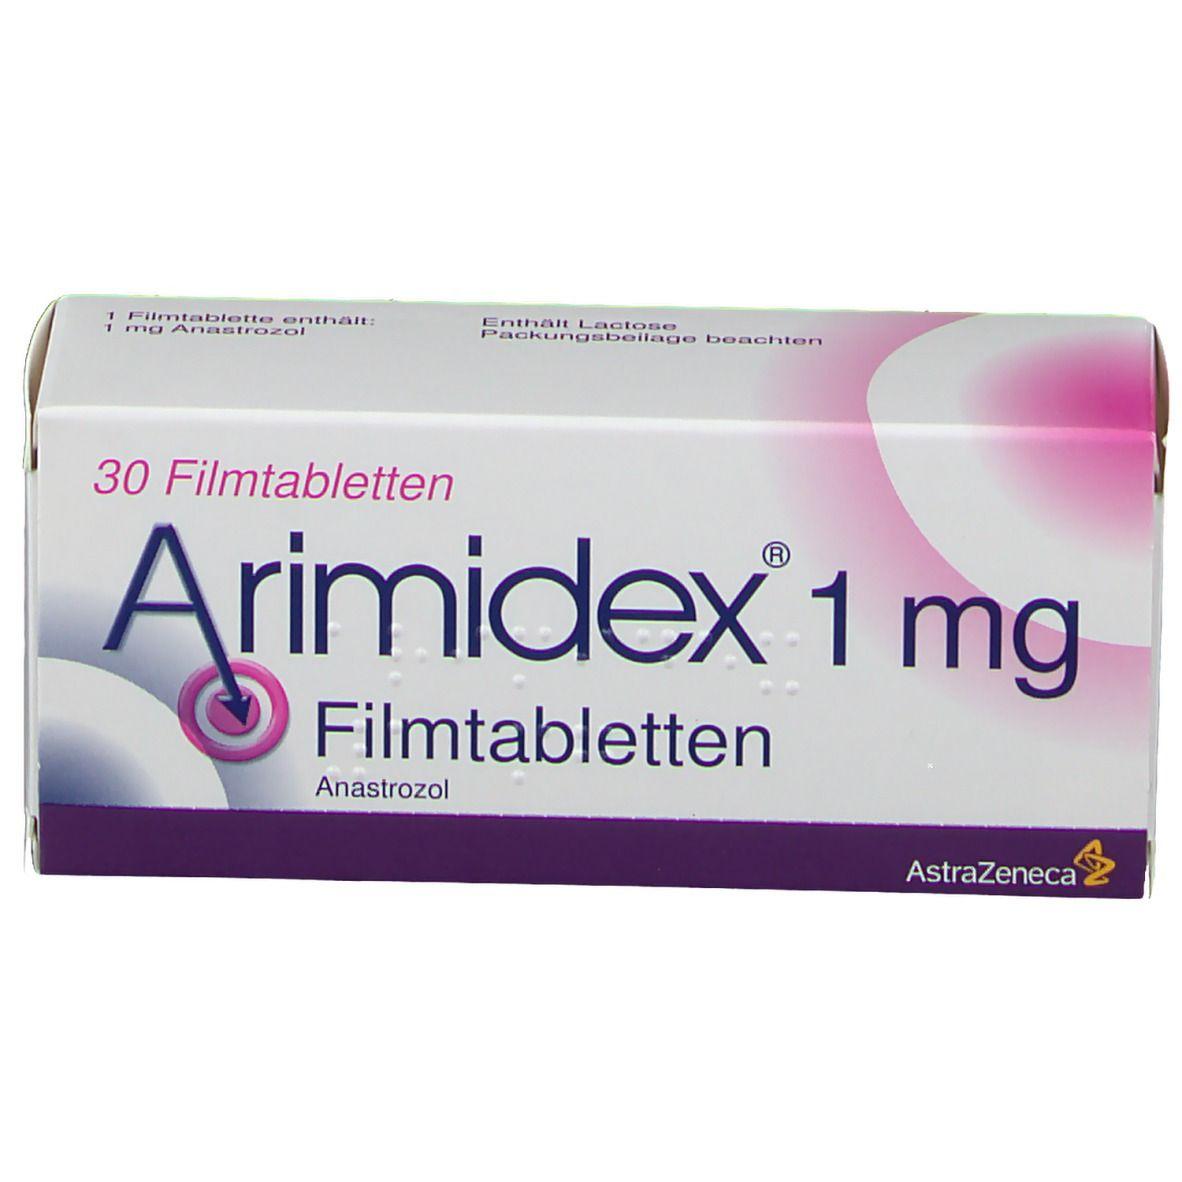 Arimidex mx side effects mayo clinic